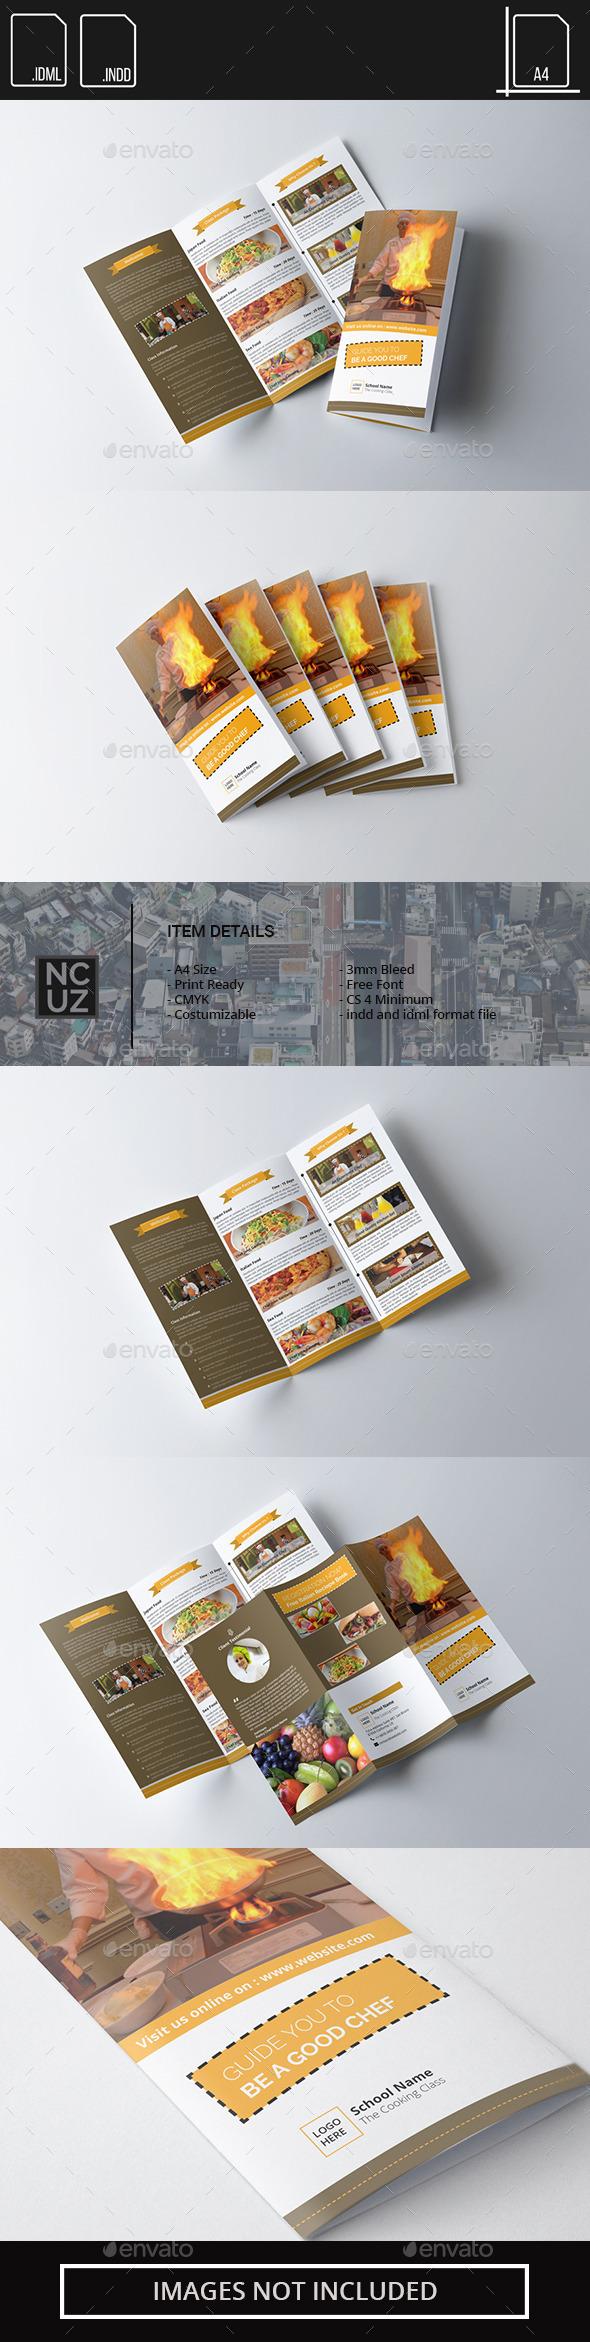 Brochure Trifold School Chef - Corporate Brochures